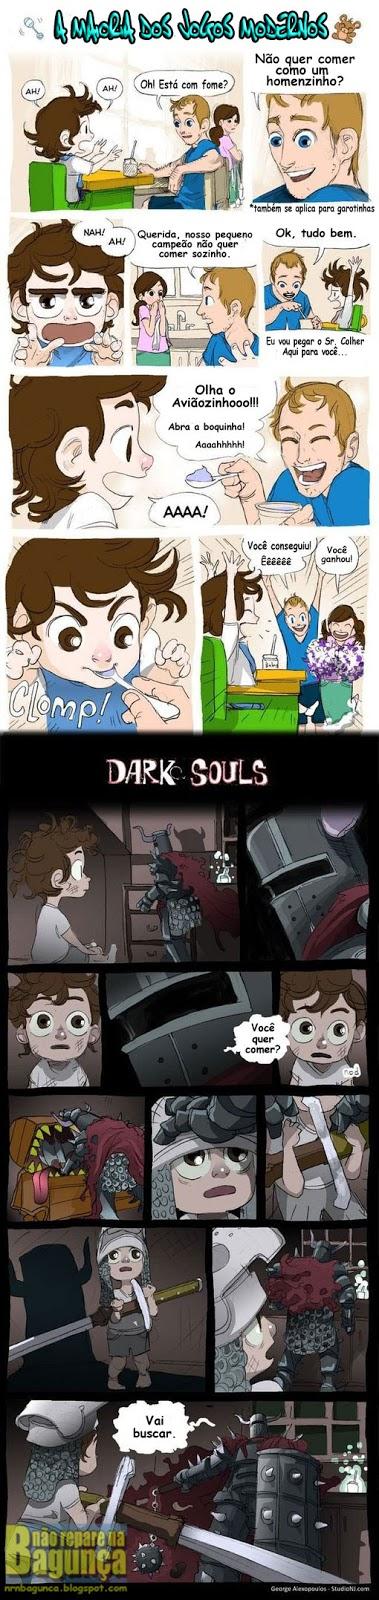 Dark Souls vs. Jogos Modernos